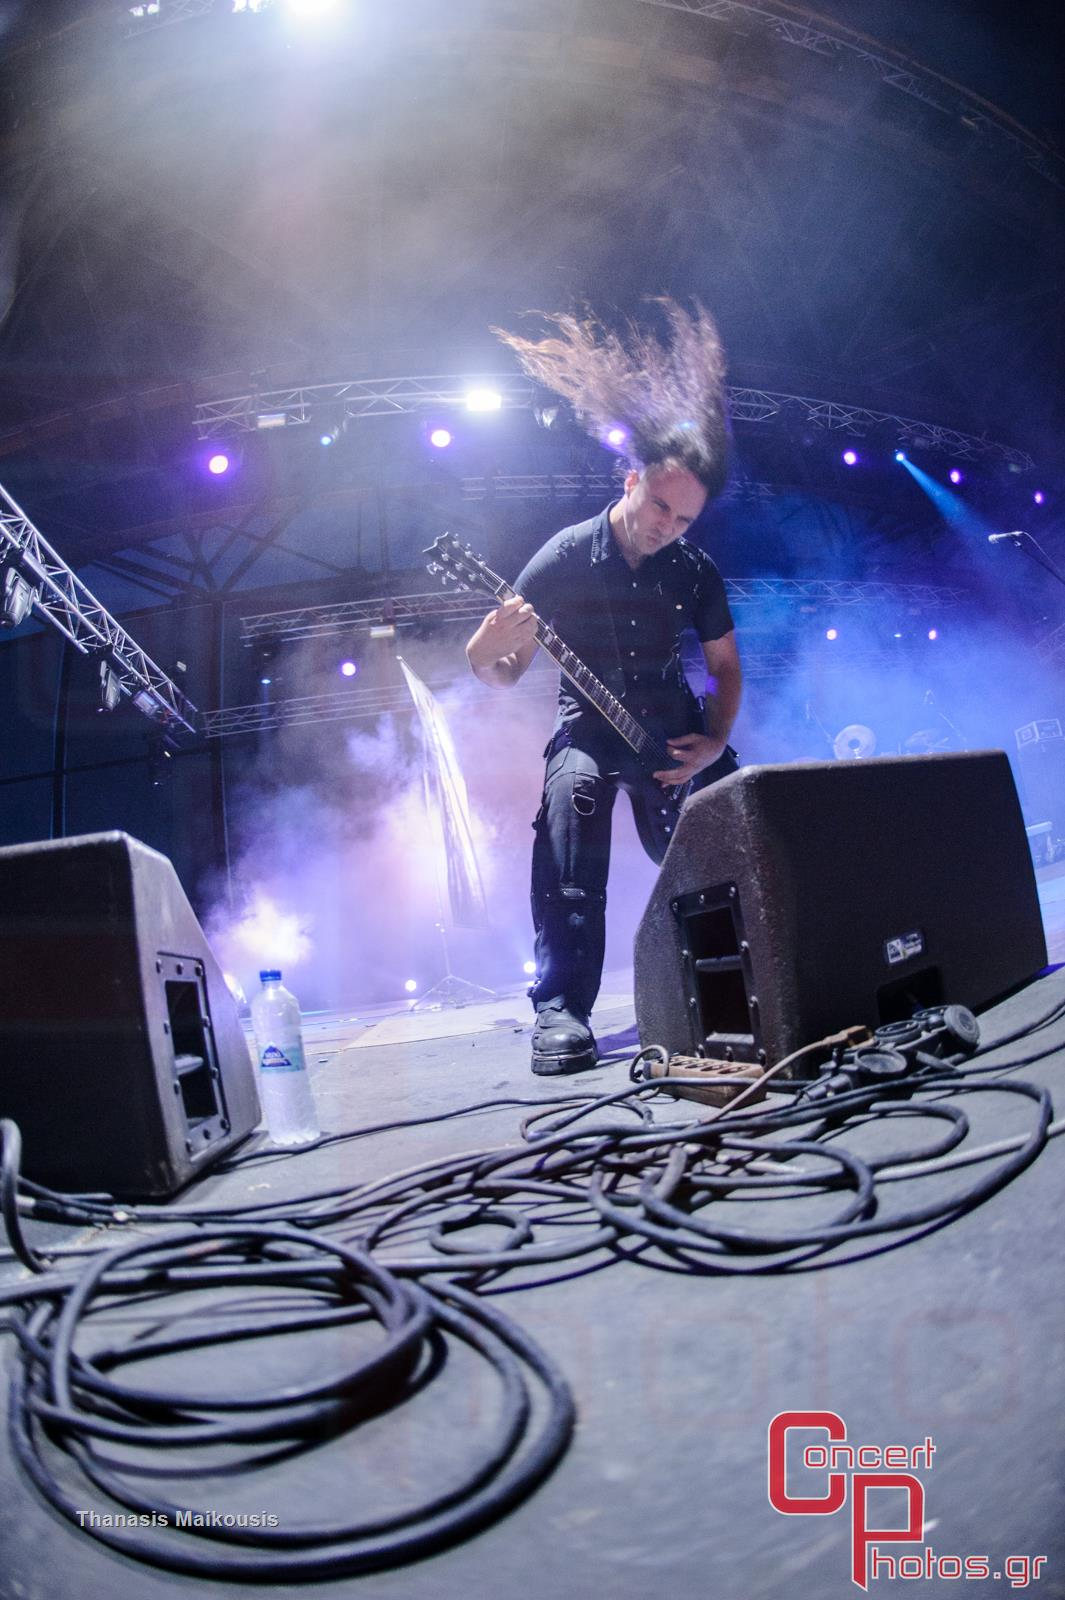 Septic Flesh-Septic Flesh photographer: Thanasis Maikousis - concertphotos_-8105